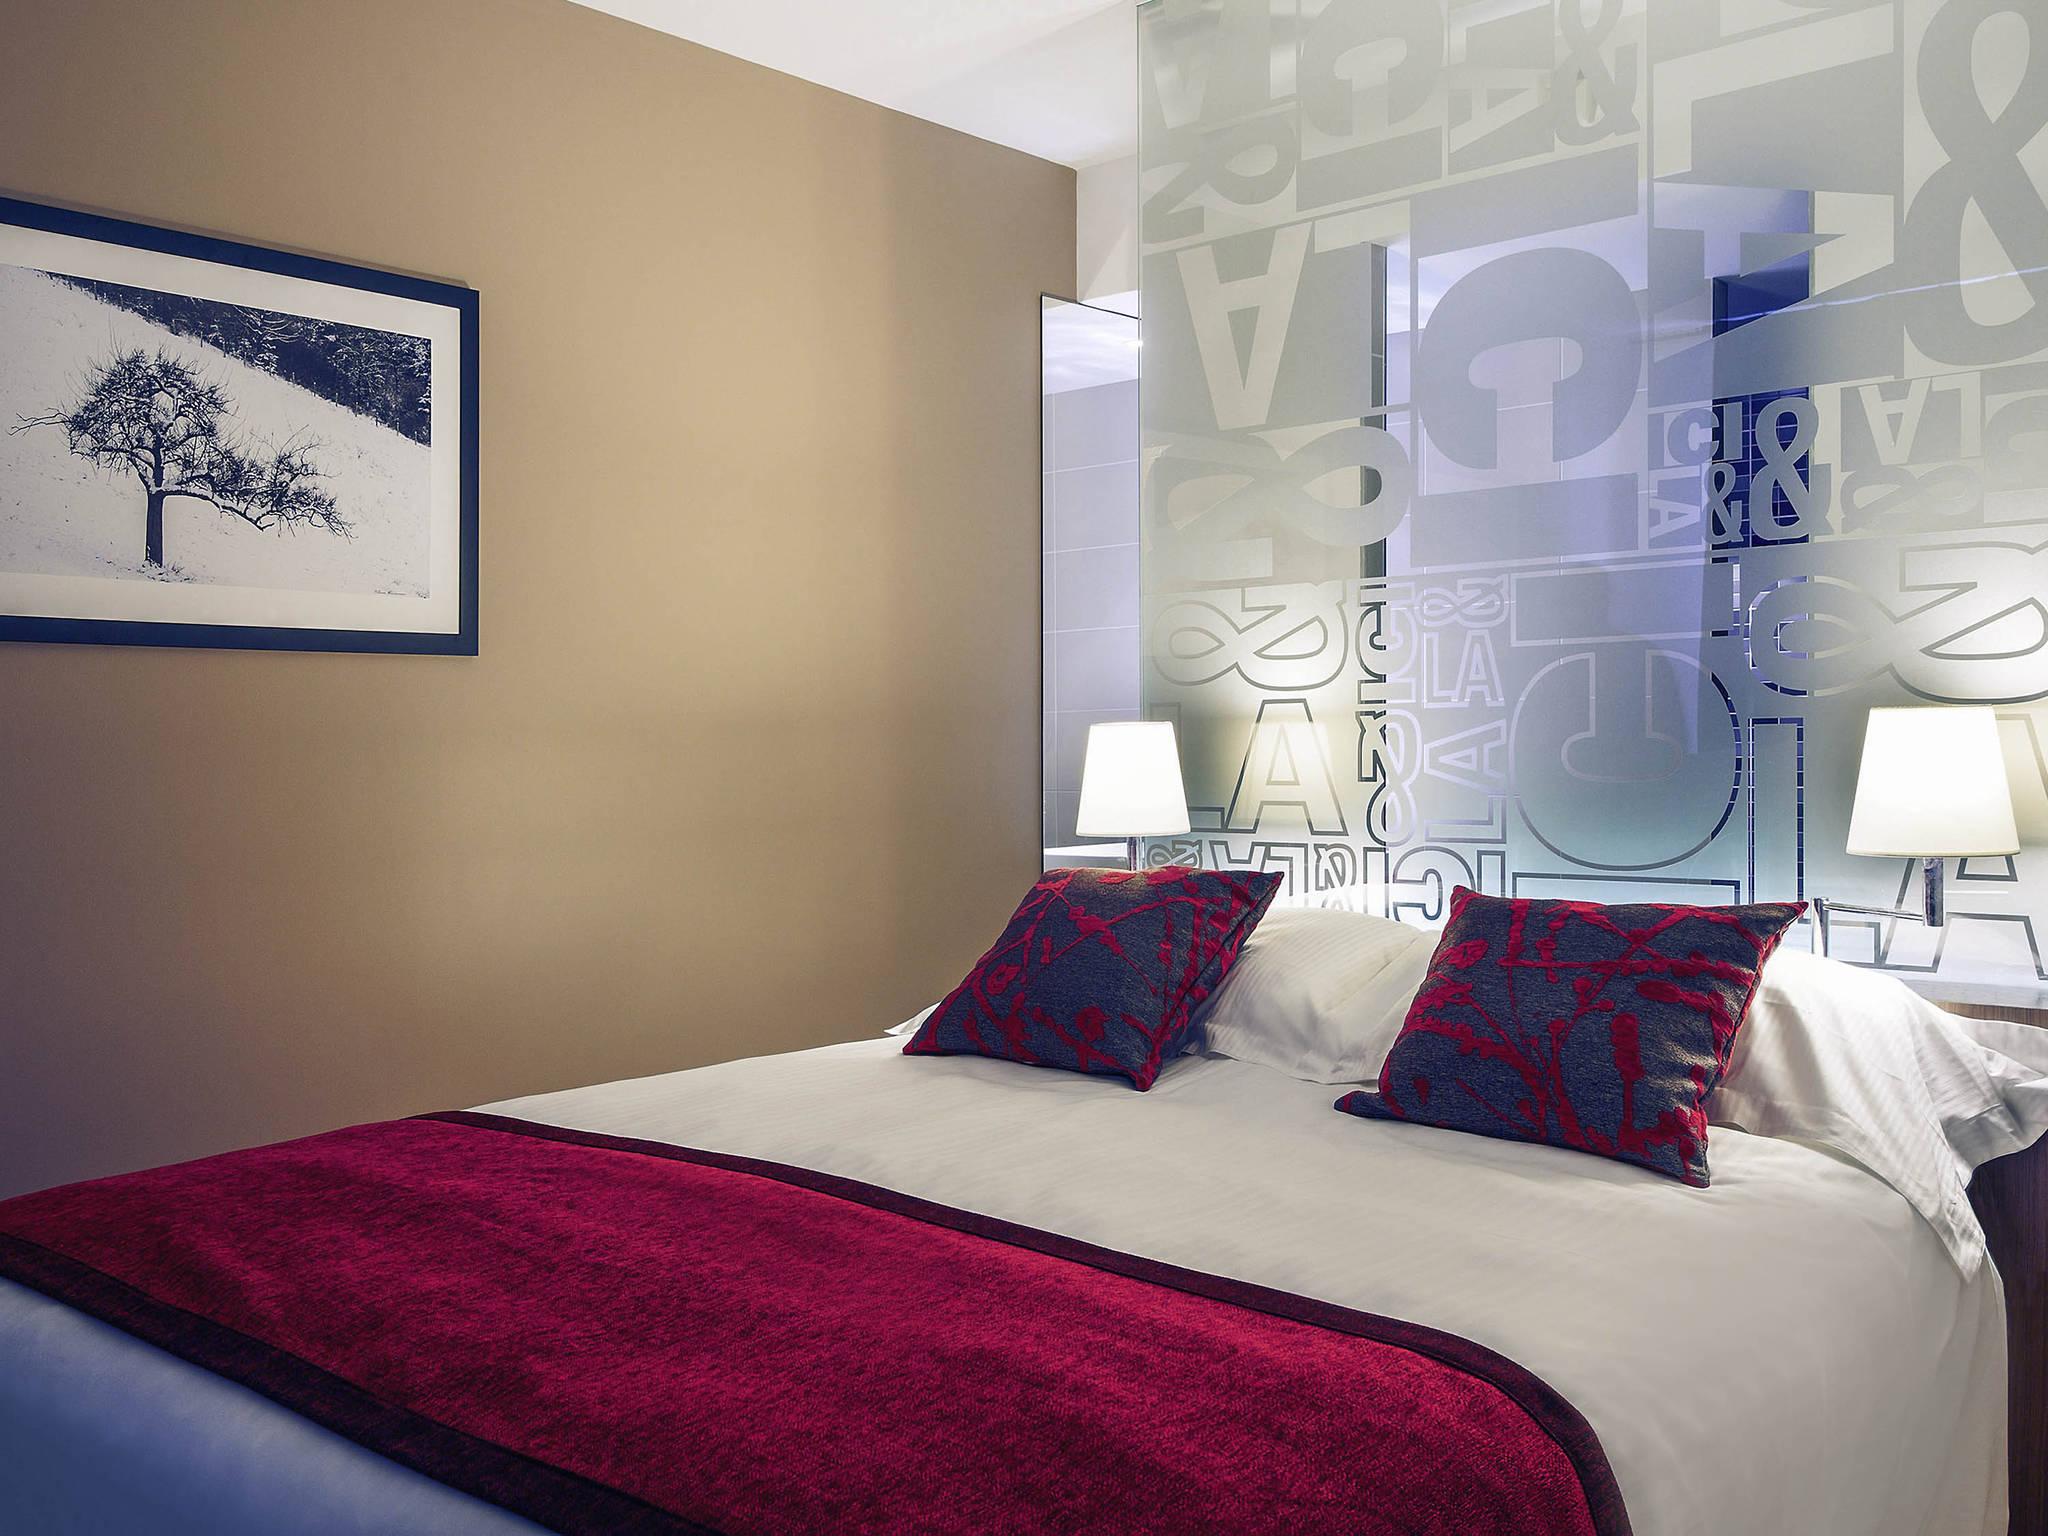 Hotell – Hôtel Mercure Villefranche en Beaujolais Ici & Là